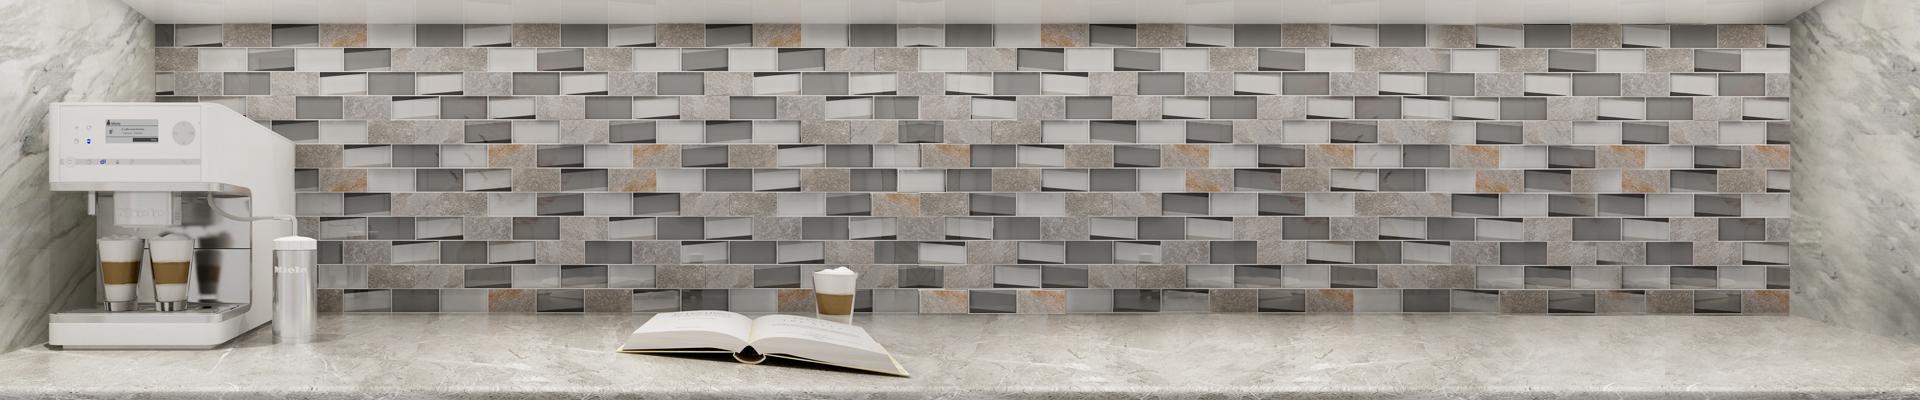 video-water pool mosaics deck for bathroom Heng Xing-Heng Xing-img